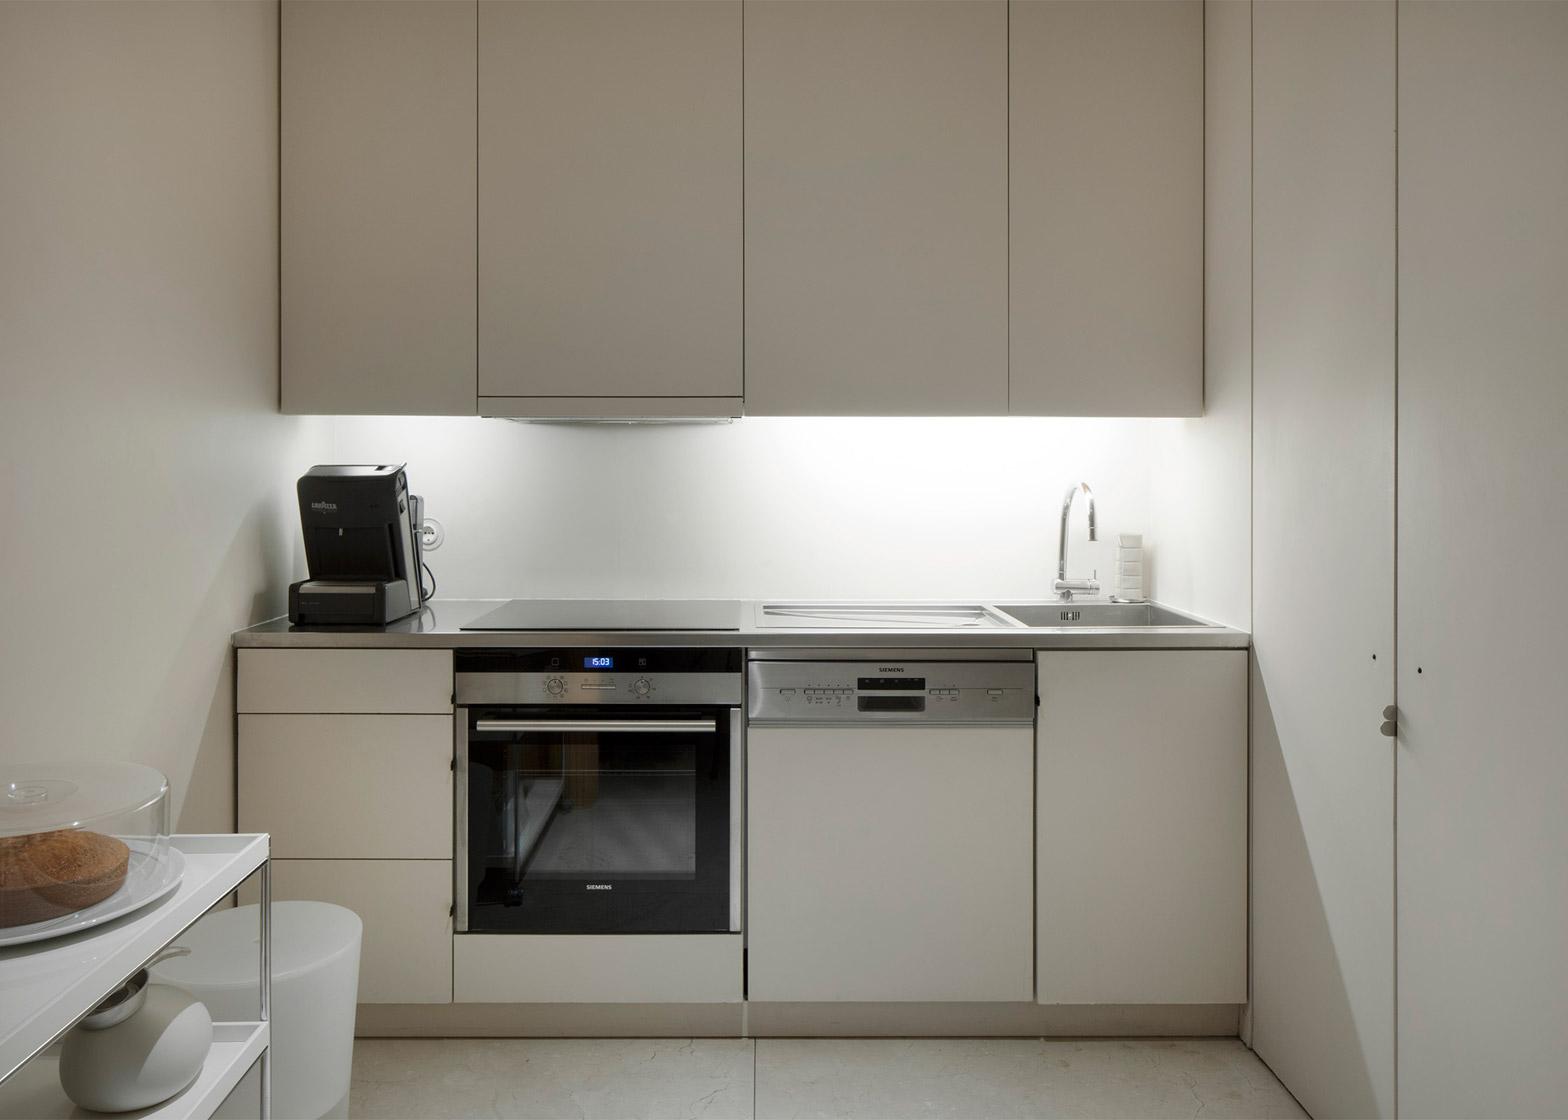 Architecture-courtyard-design-studia-interiors-osnovadesign-osnova-poltava-04